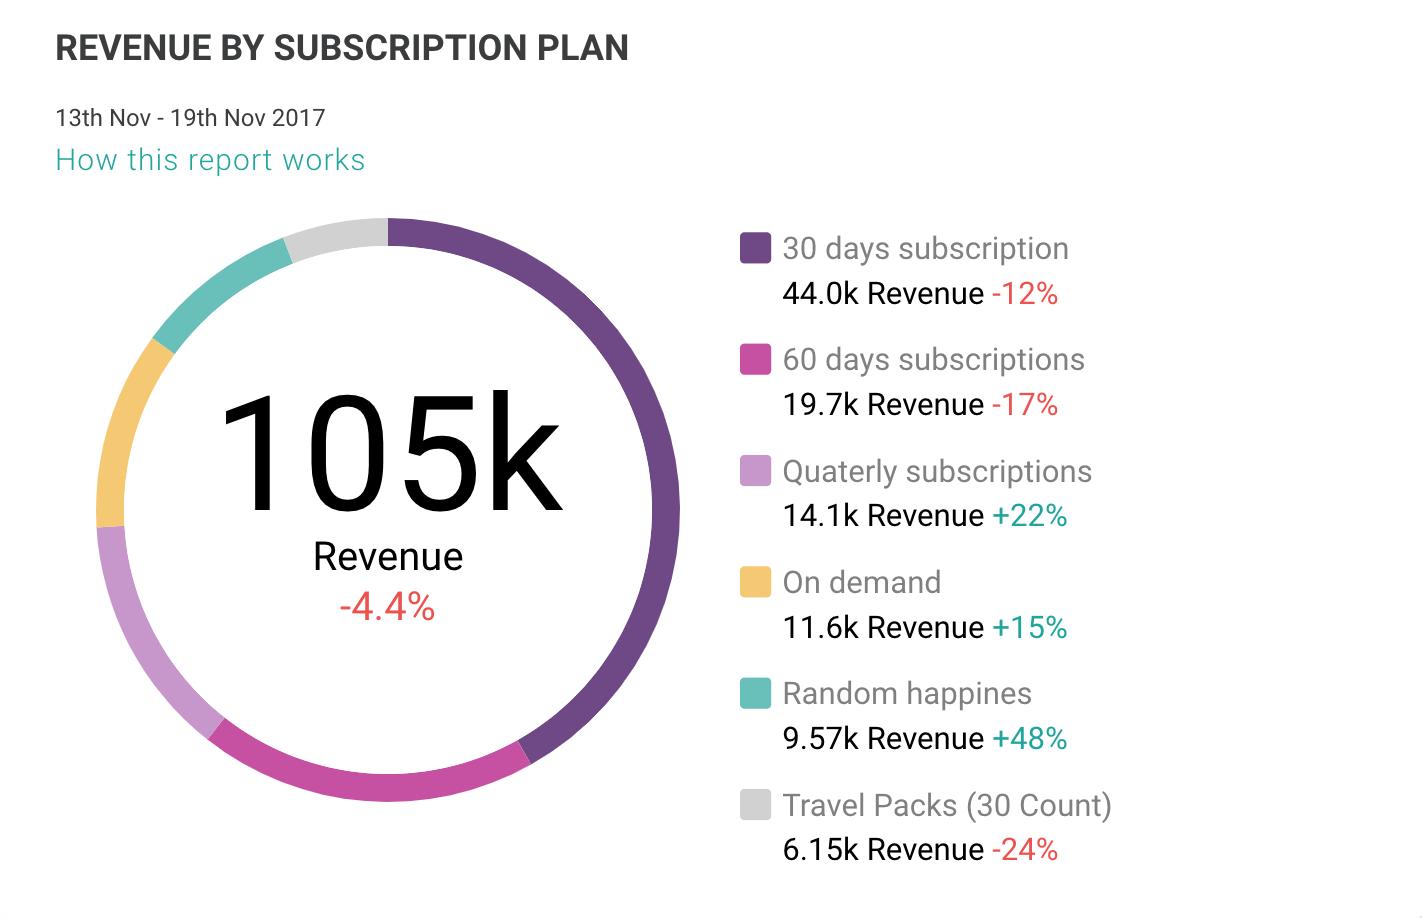 Revenue by subscription plan